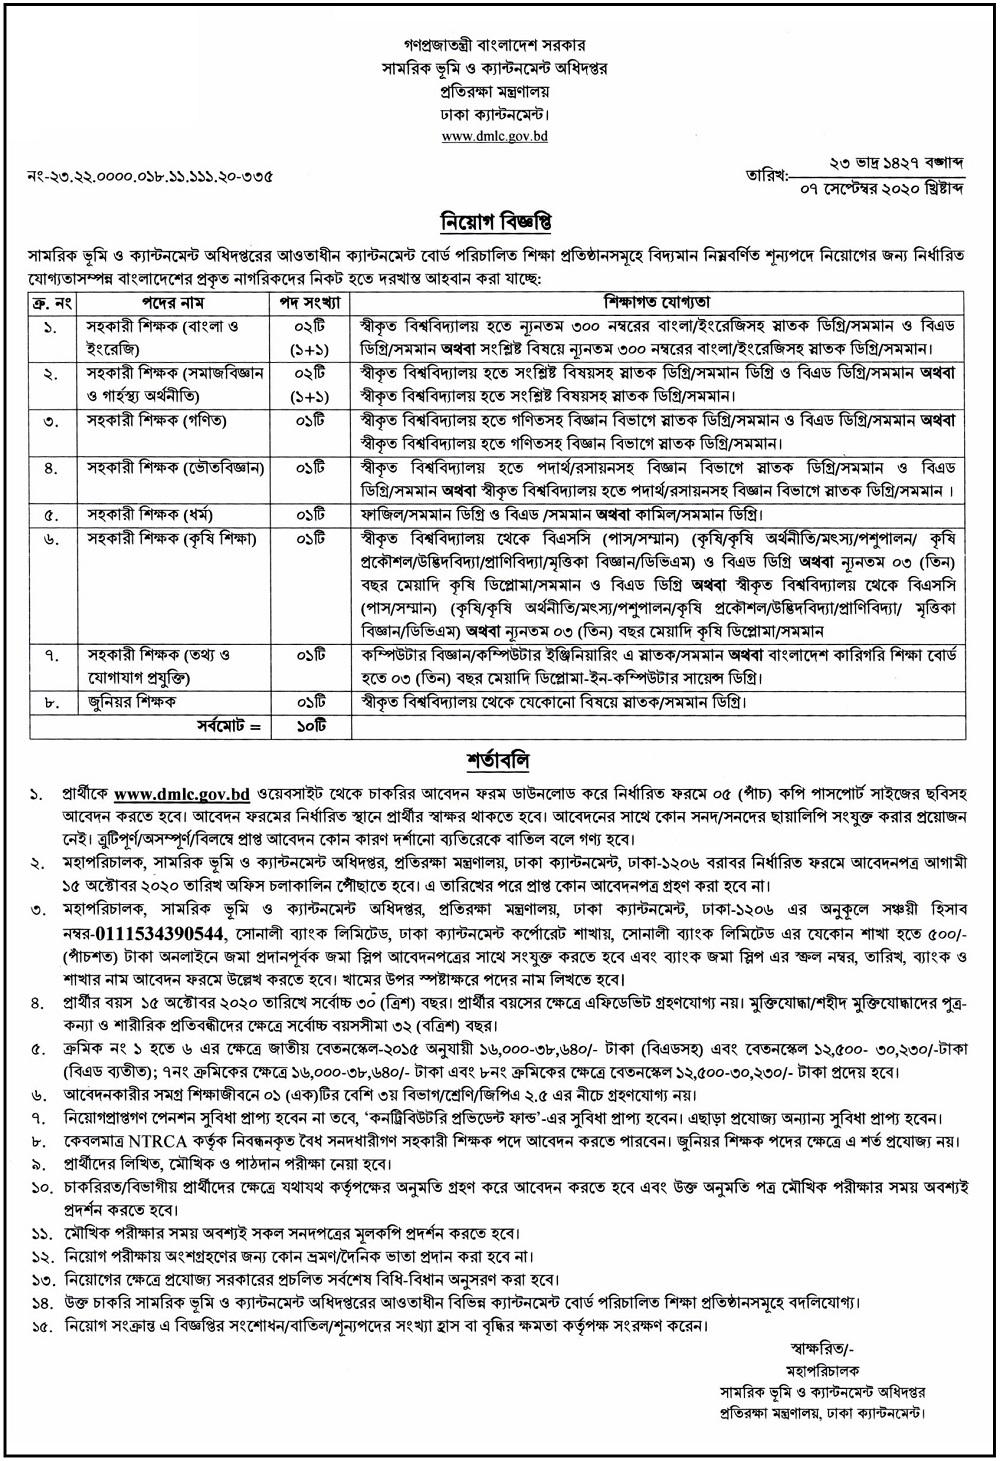 DMLC Job Circular - dmlc.gov.bd